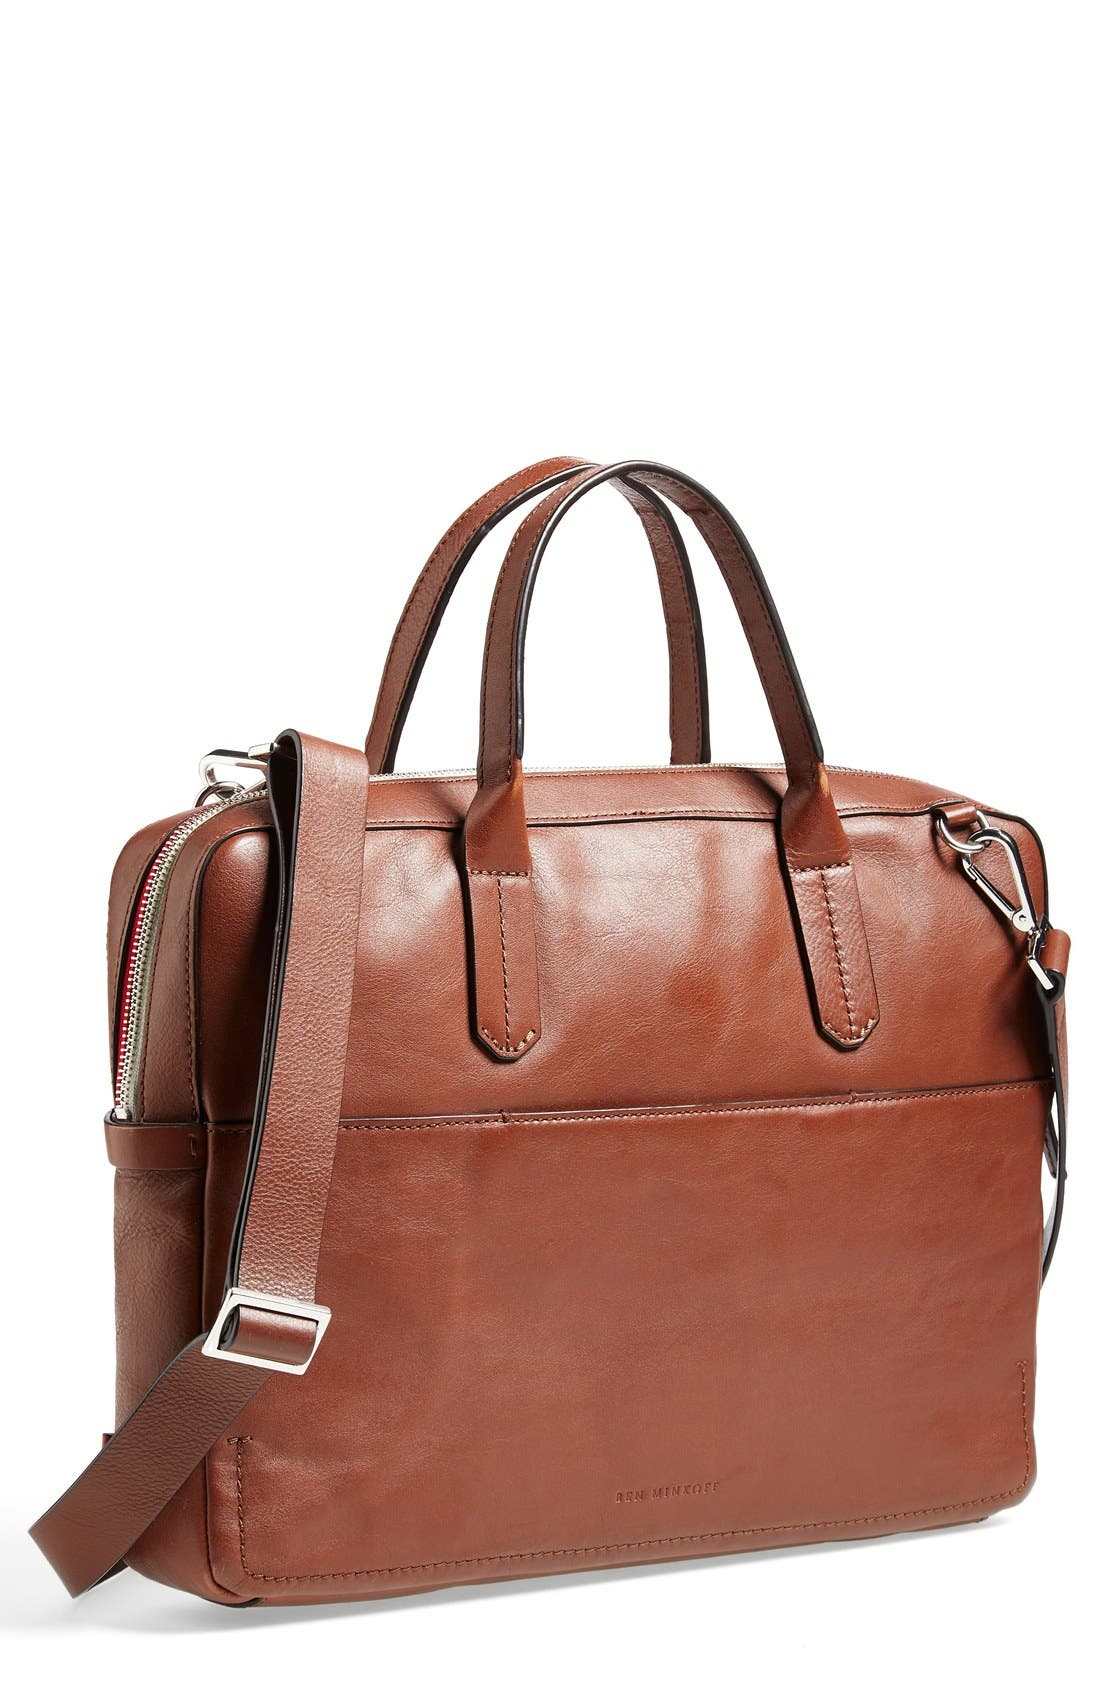 Ben Minkoff 'Fulton' Leather Briefcase, Main, color, 233